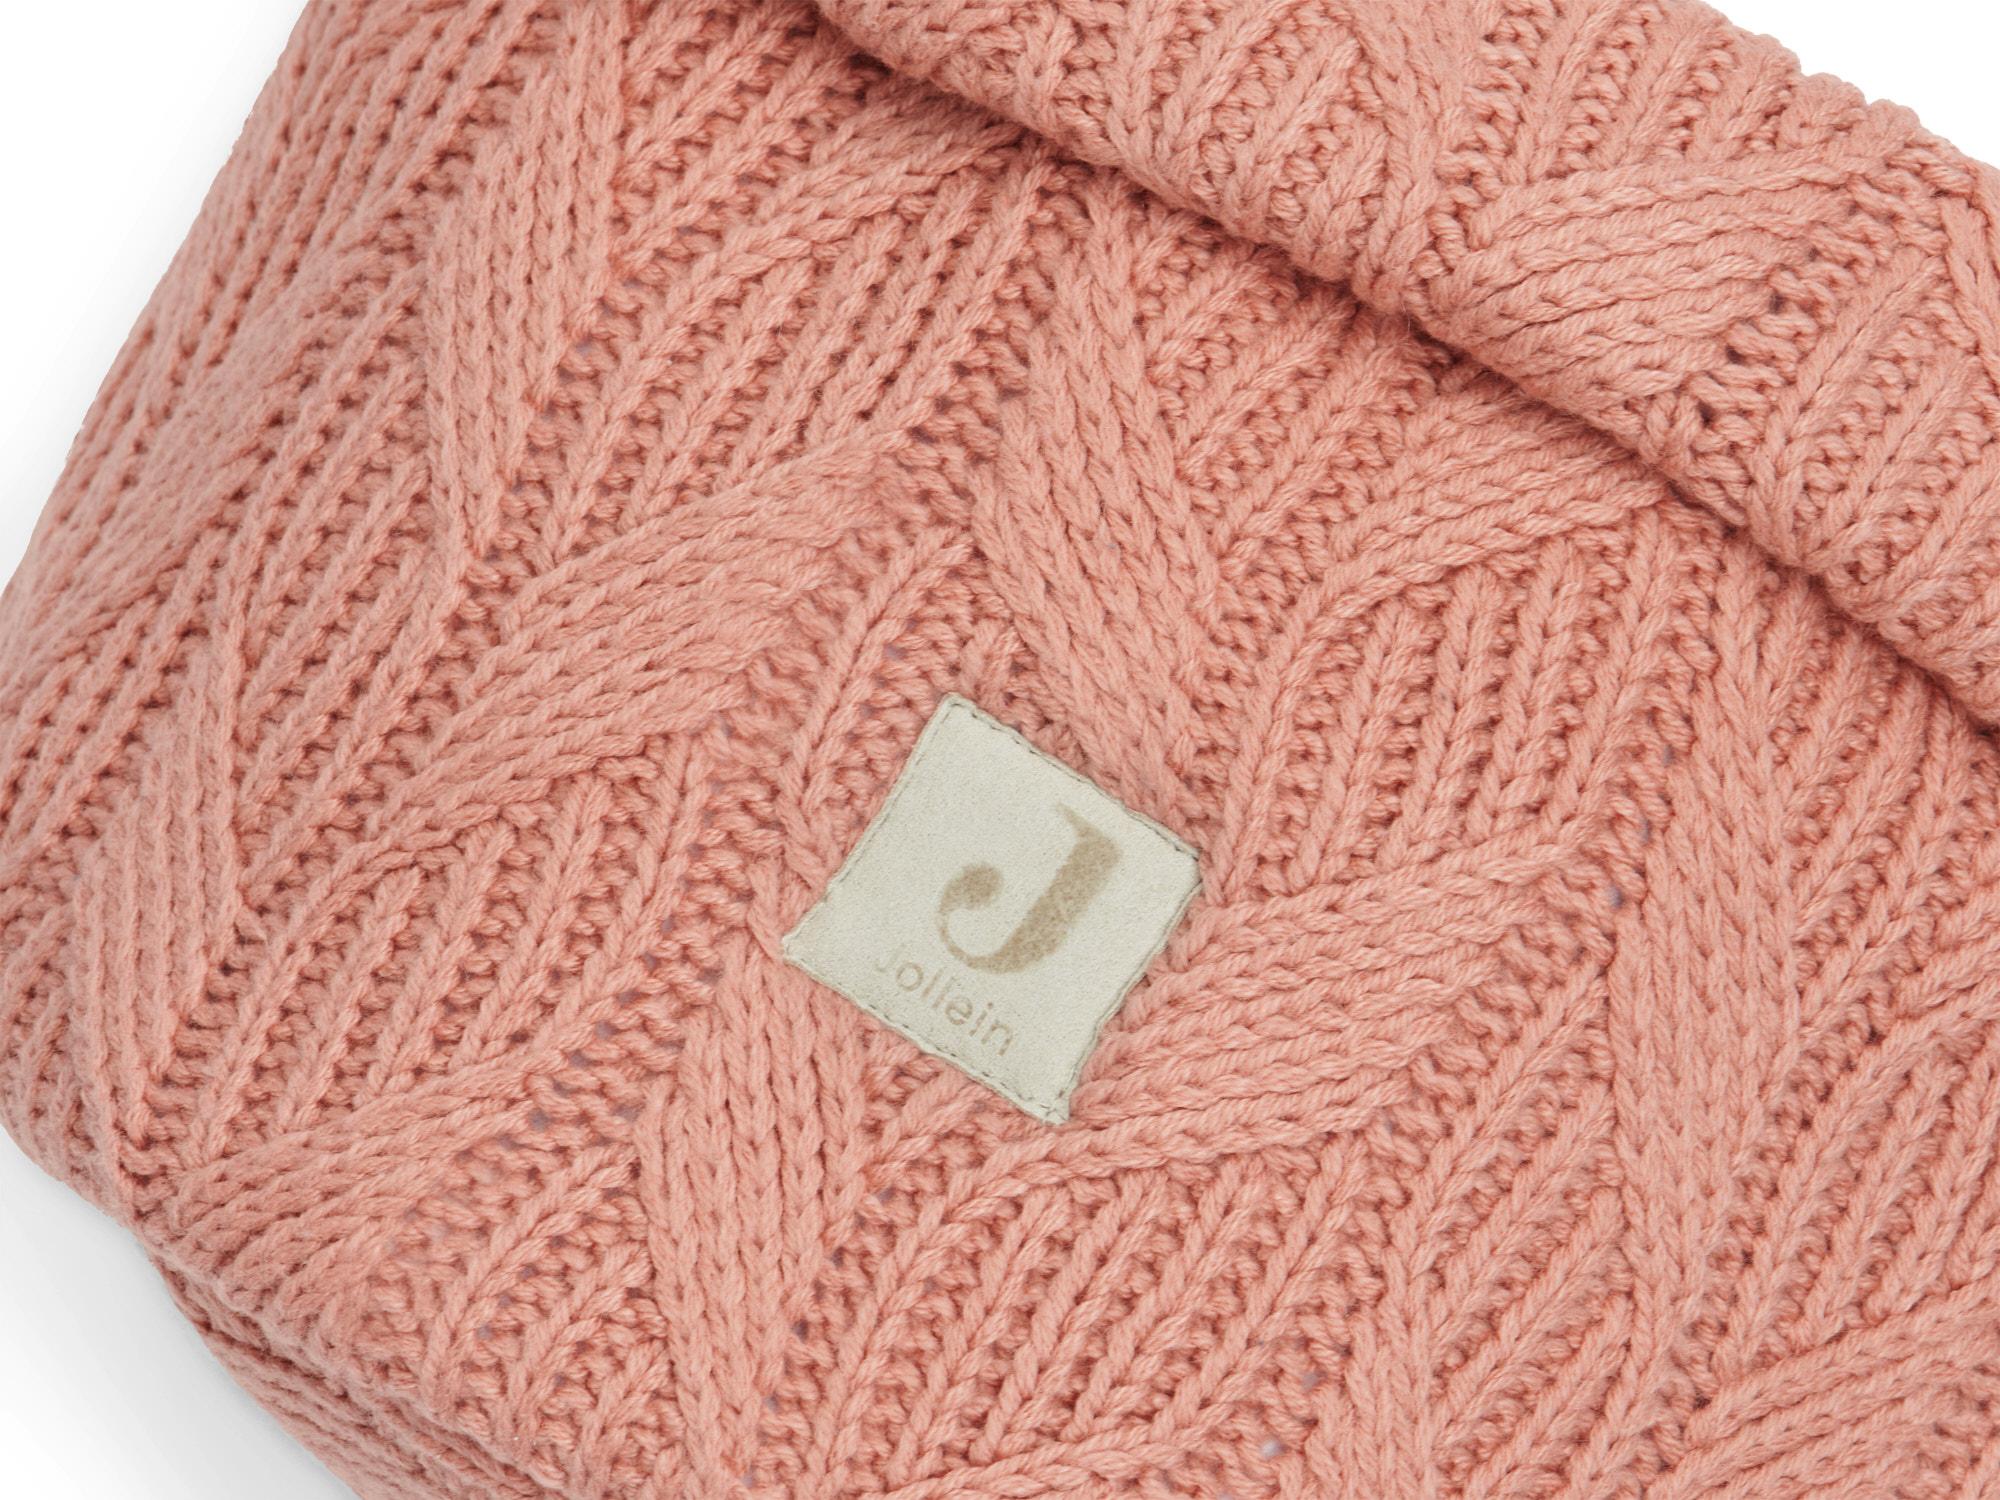 Afbeelding Jollein Commodemandje Spring Knit I Rosewood